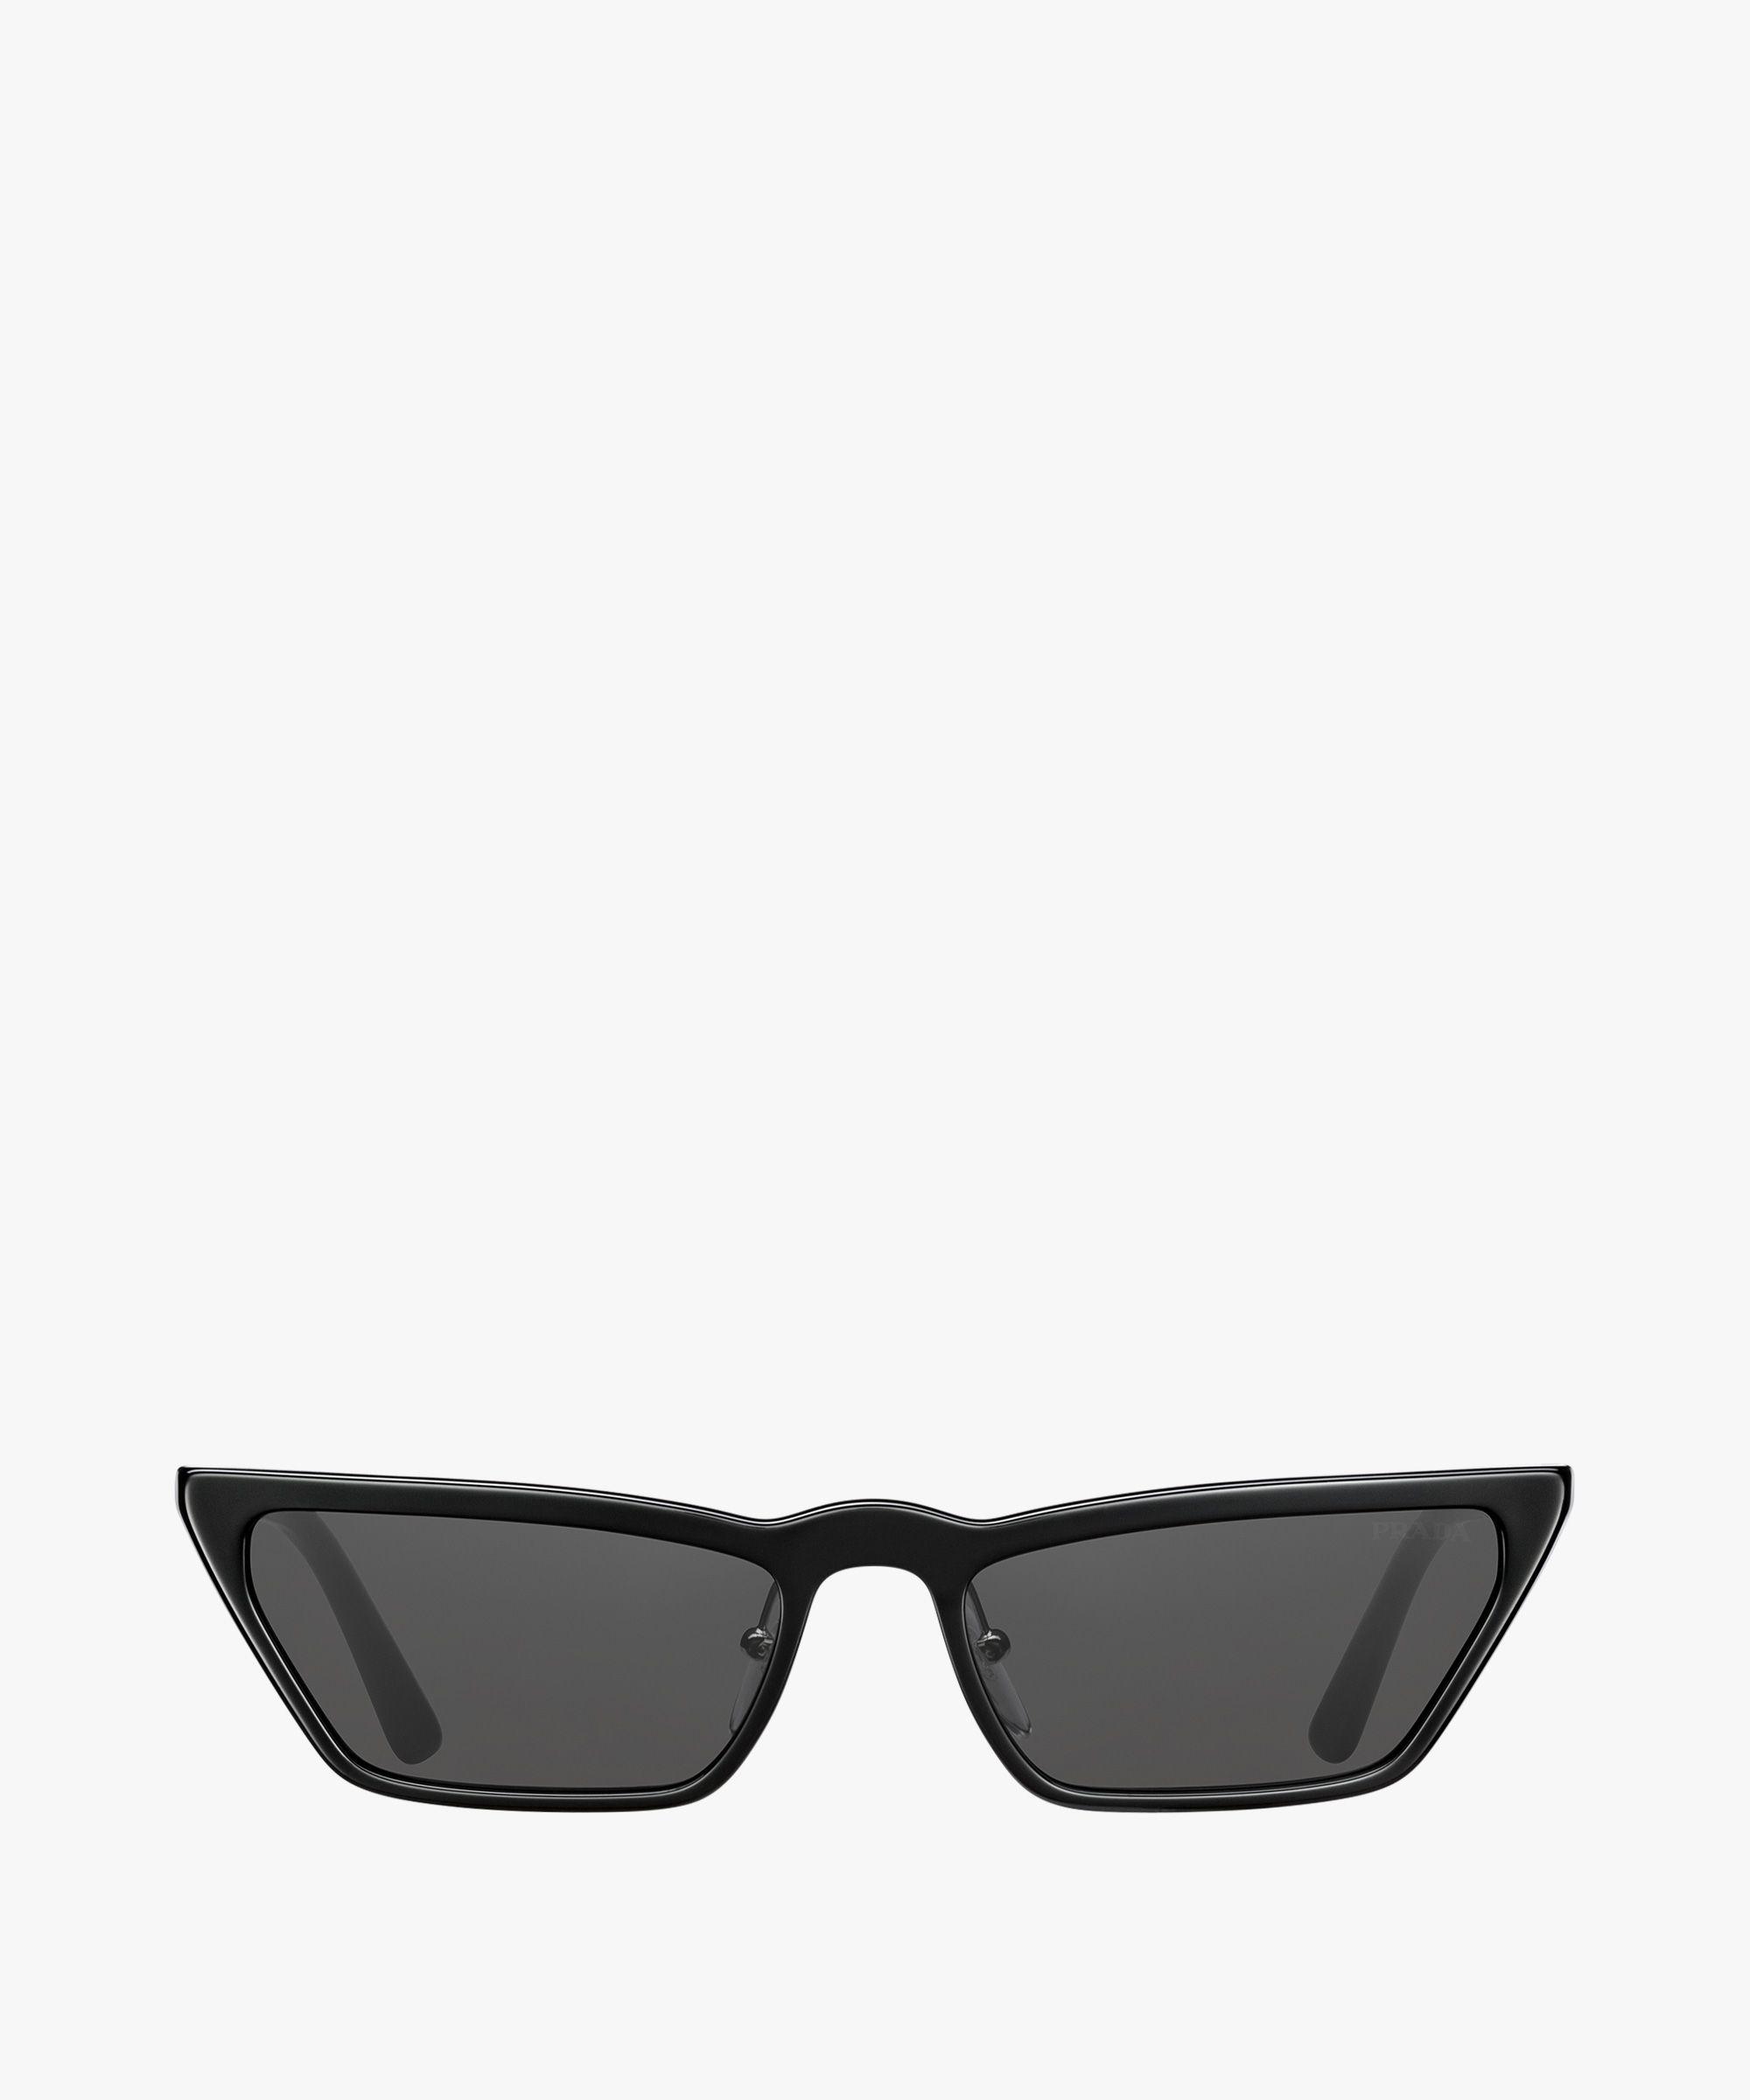 a17985b7900e Prada - Slate grey lenses Ultravox sunglasses